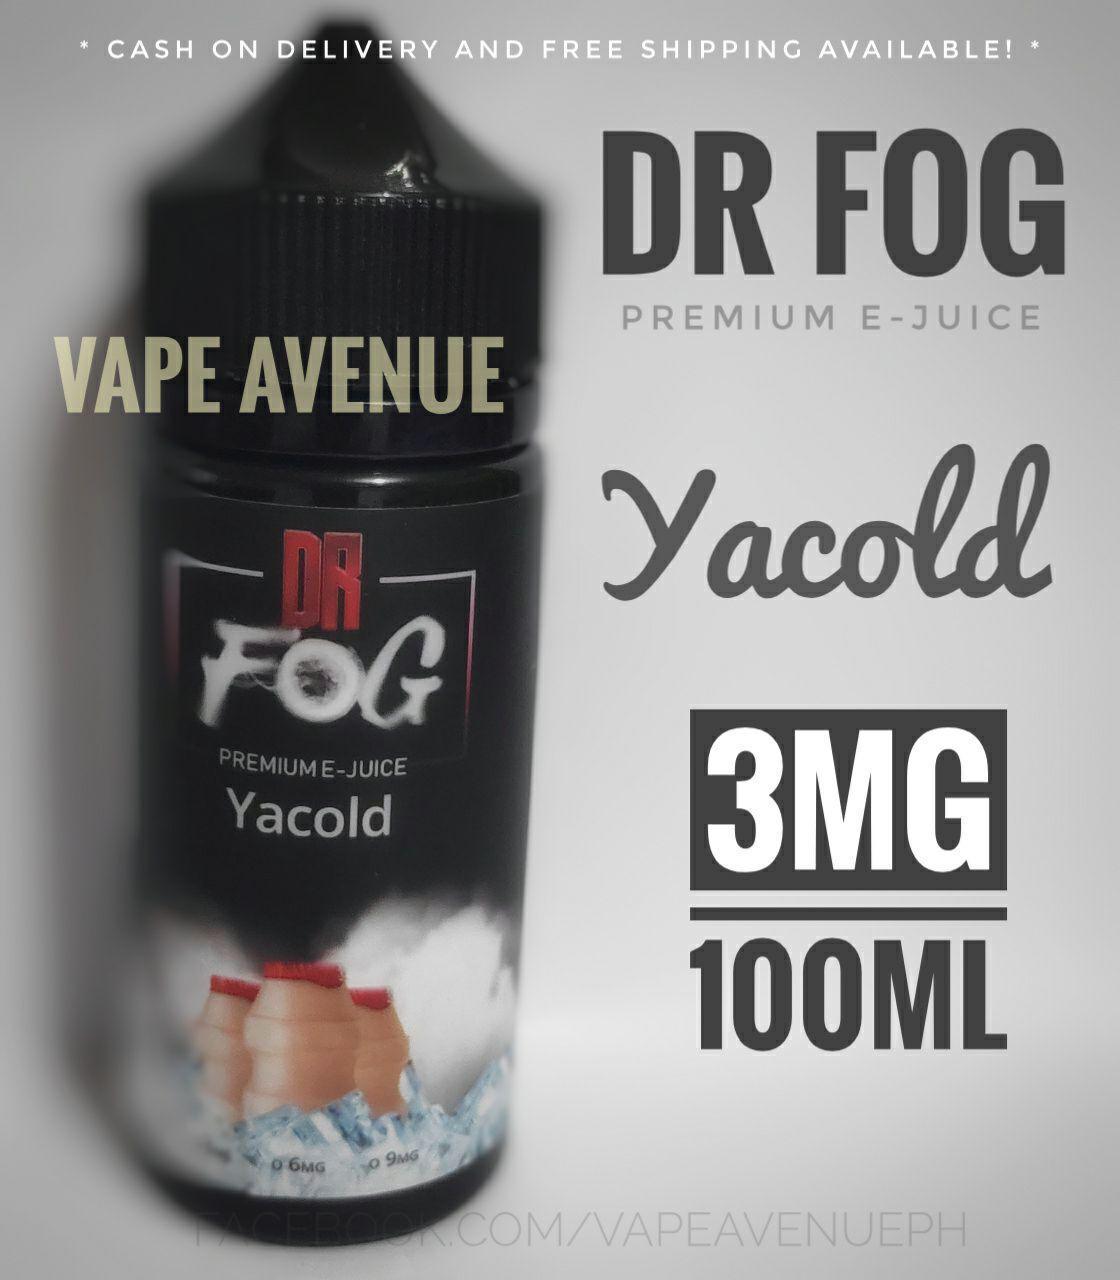 39a59d58839f DR FOG eLiquid 3MG 100ML [ Frozen Lychee / Strawberry Cheesecake / Creamy  Milk / Vanilla Soda / Cappuccino Delight / Yacold / Frozen Bazoocka / Sour  ...